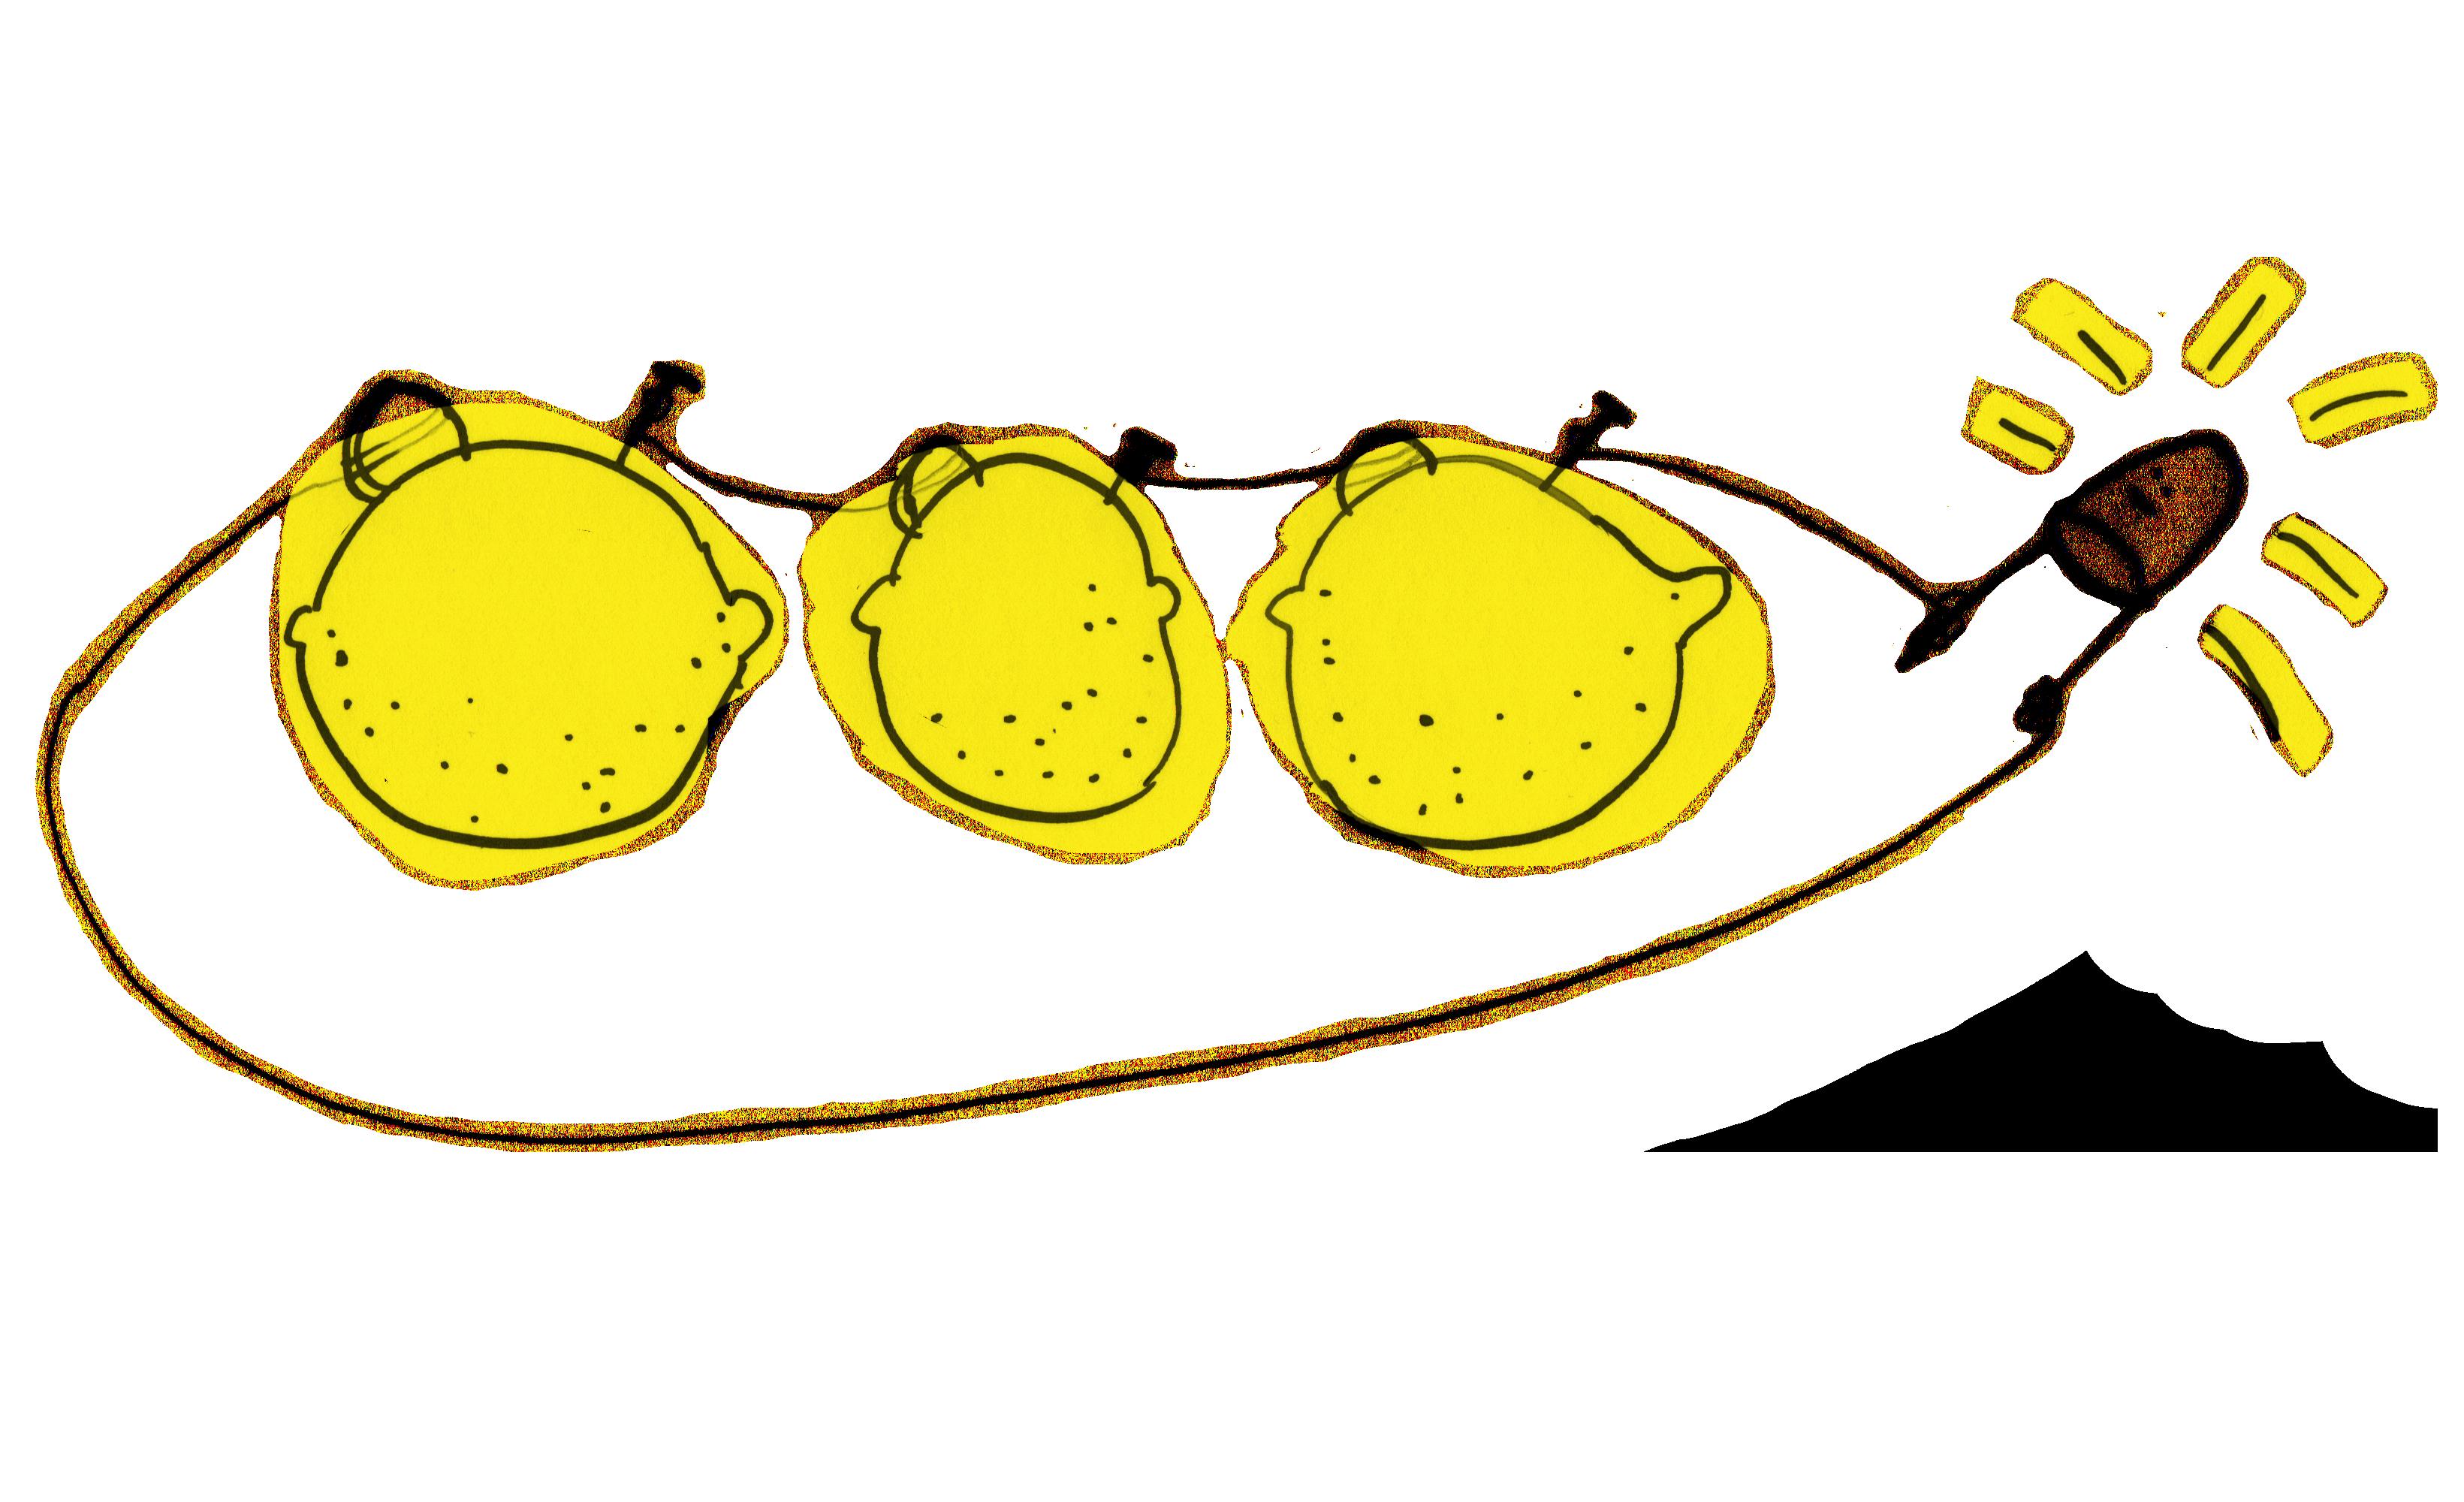 Lemons clipart lemon battery. Basics about electric circuits